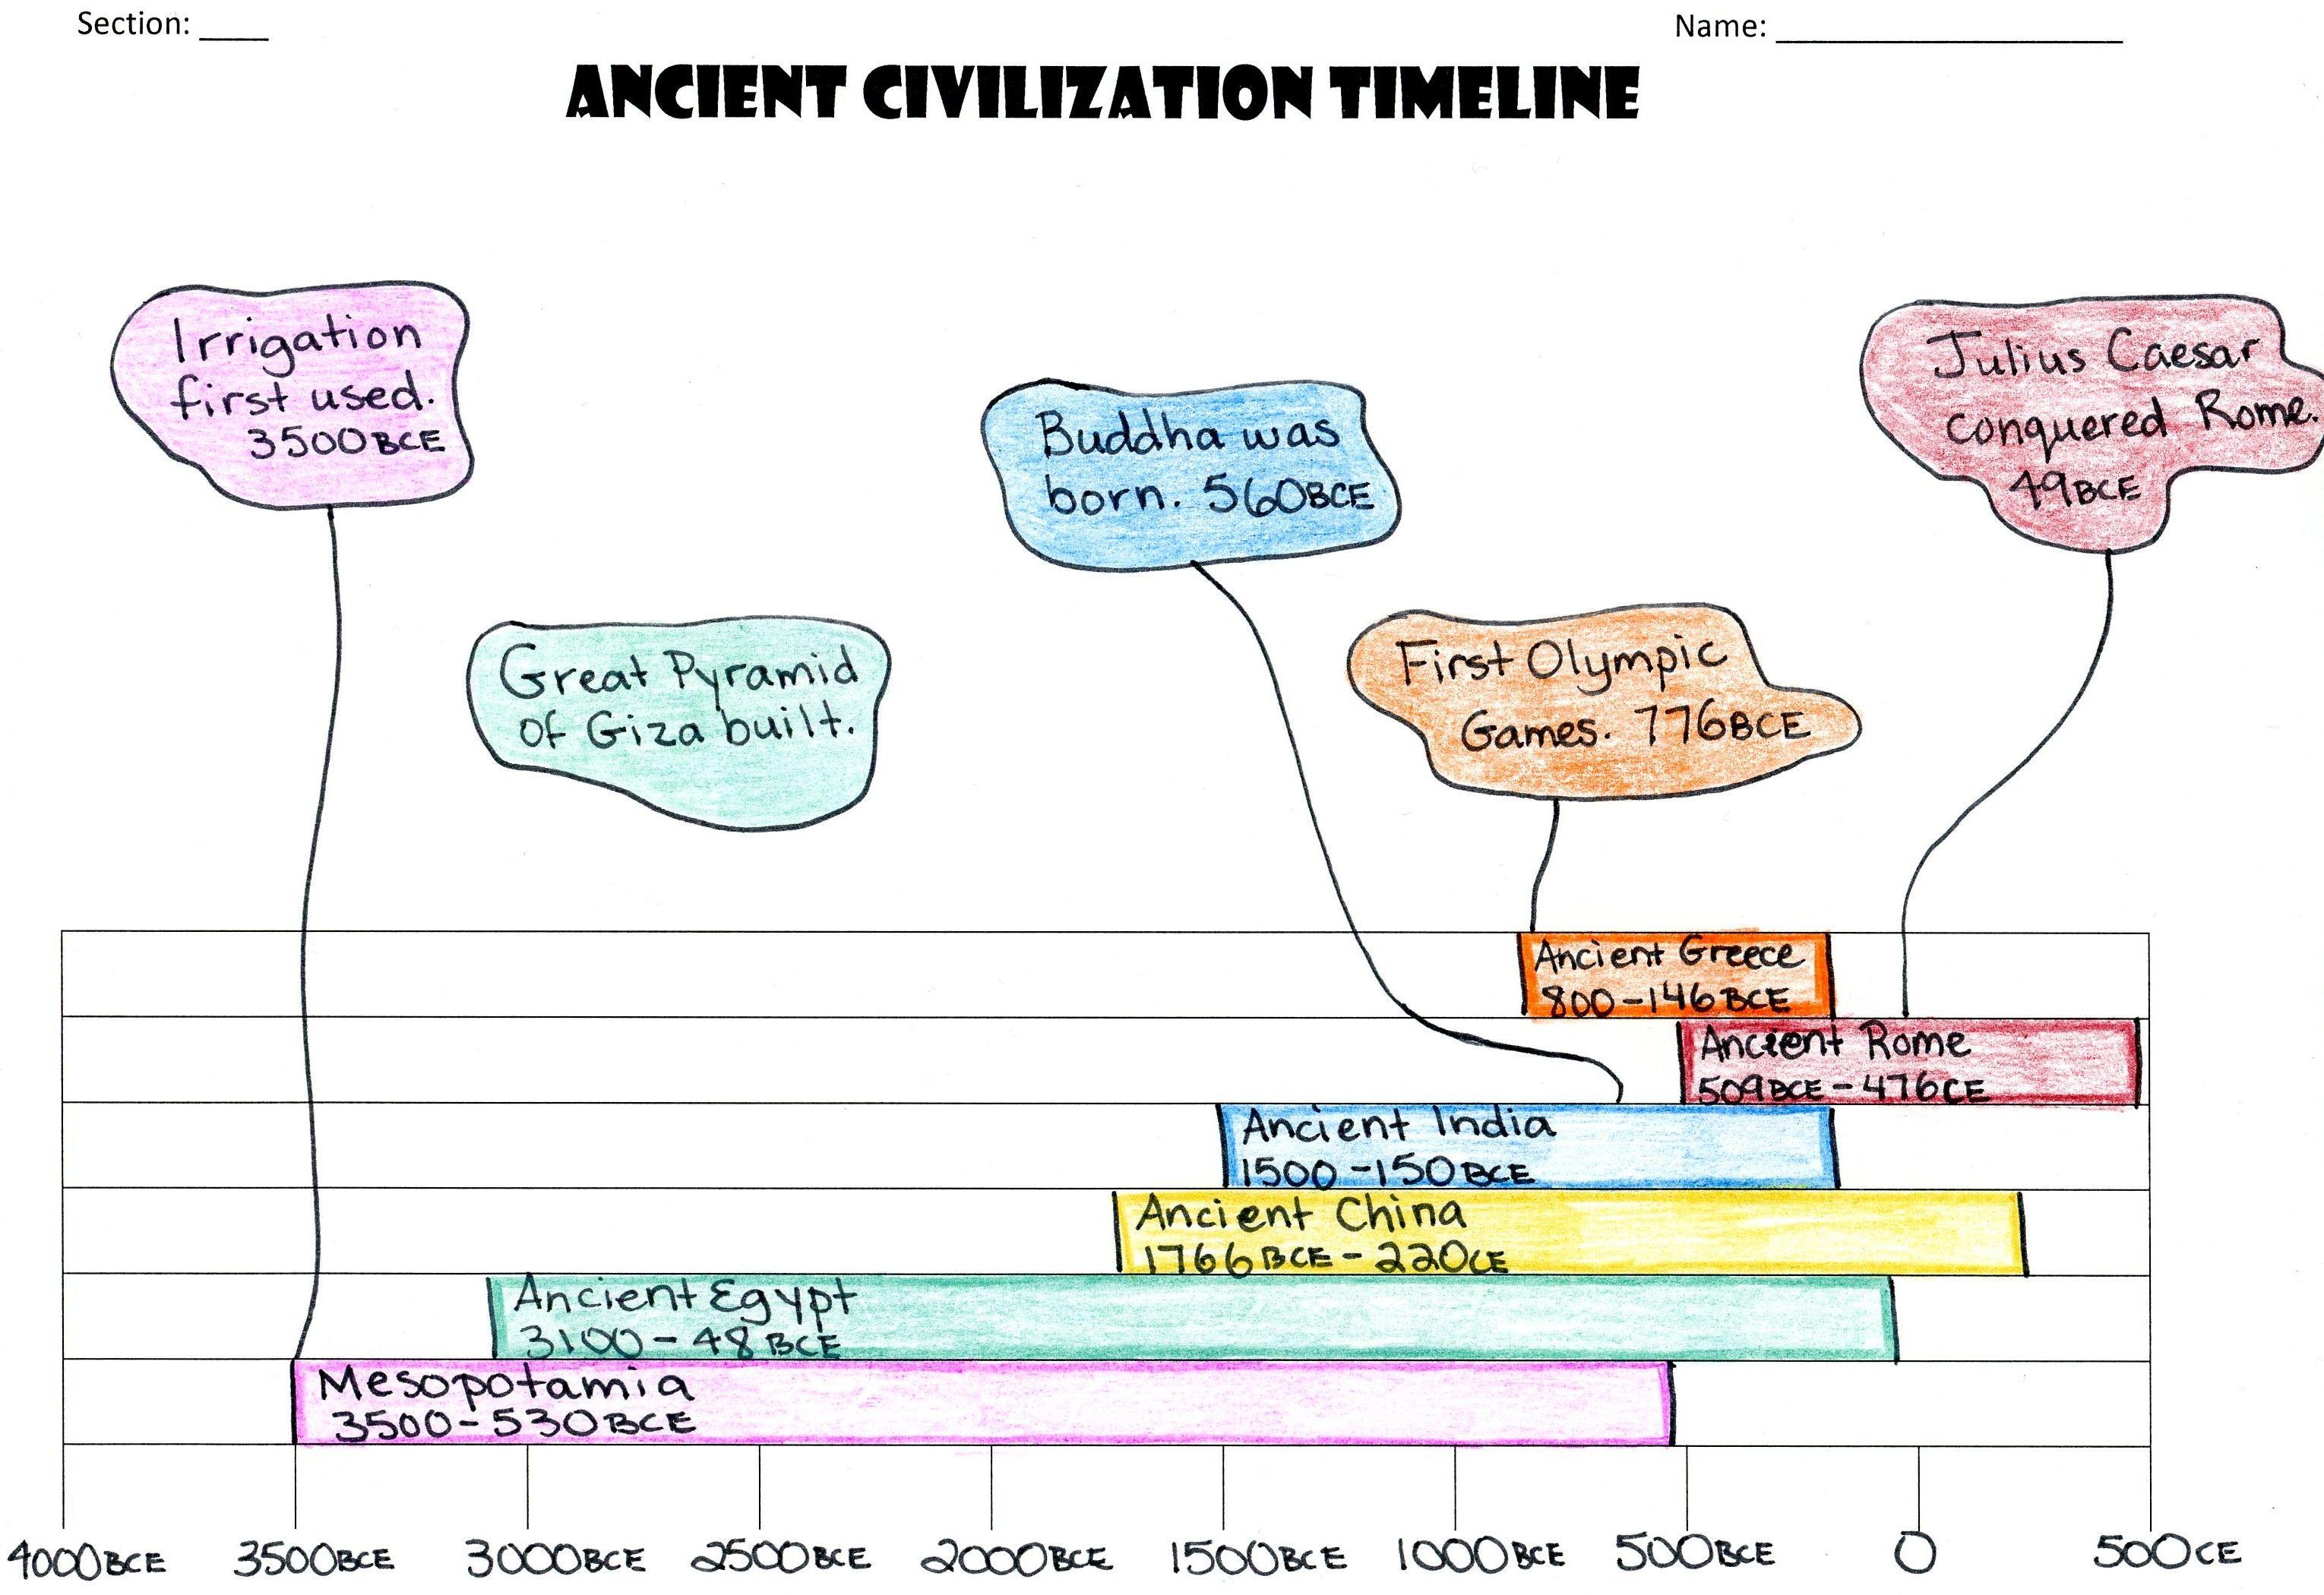 Student Timeline Notes